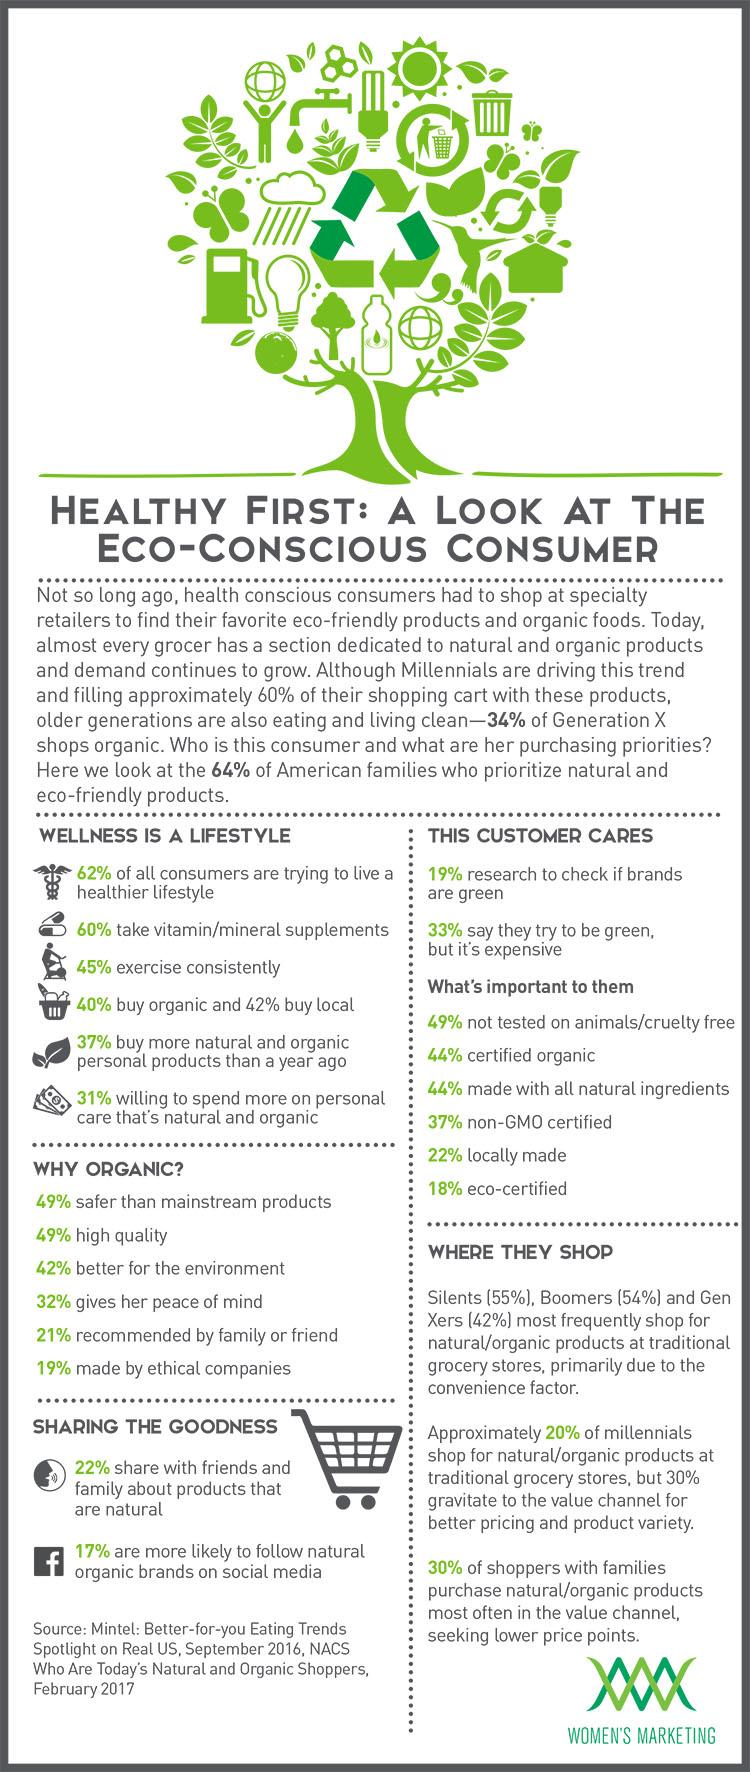 HealthyFirst_Infographic-1.jpg